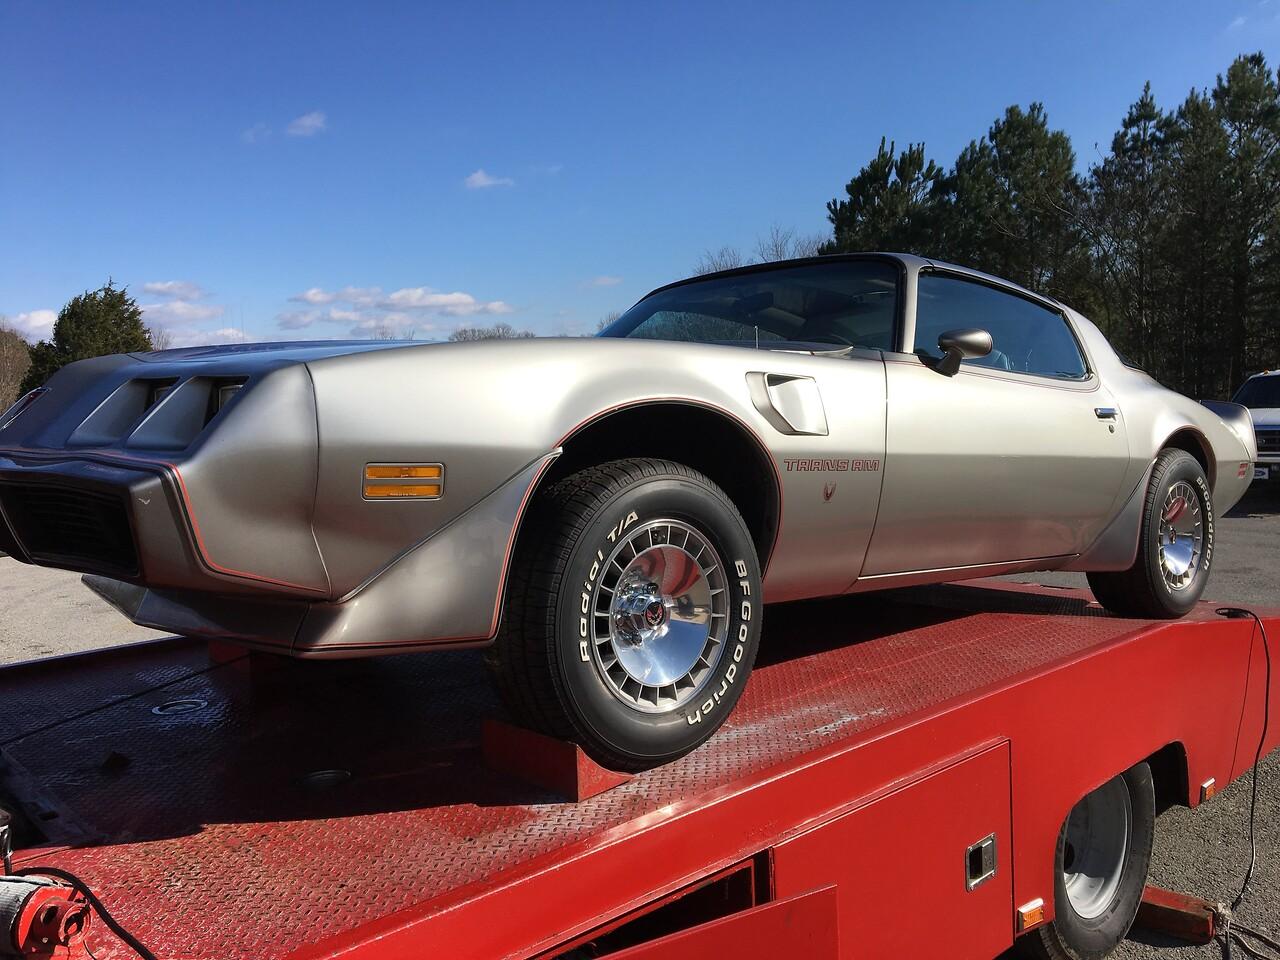 1979 Pontiac Silver Anniversary  Firebird from Nashville, Tennessee to White Bluff, Tennessee